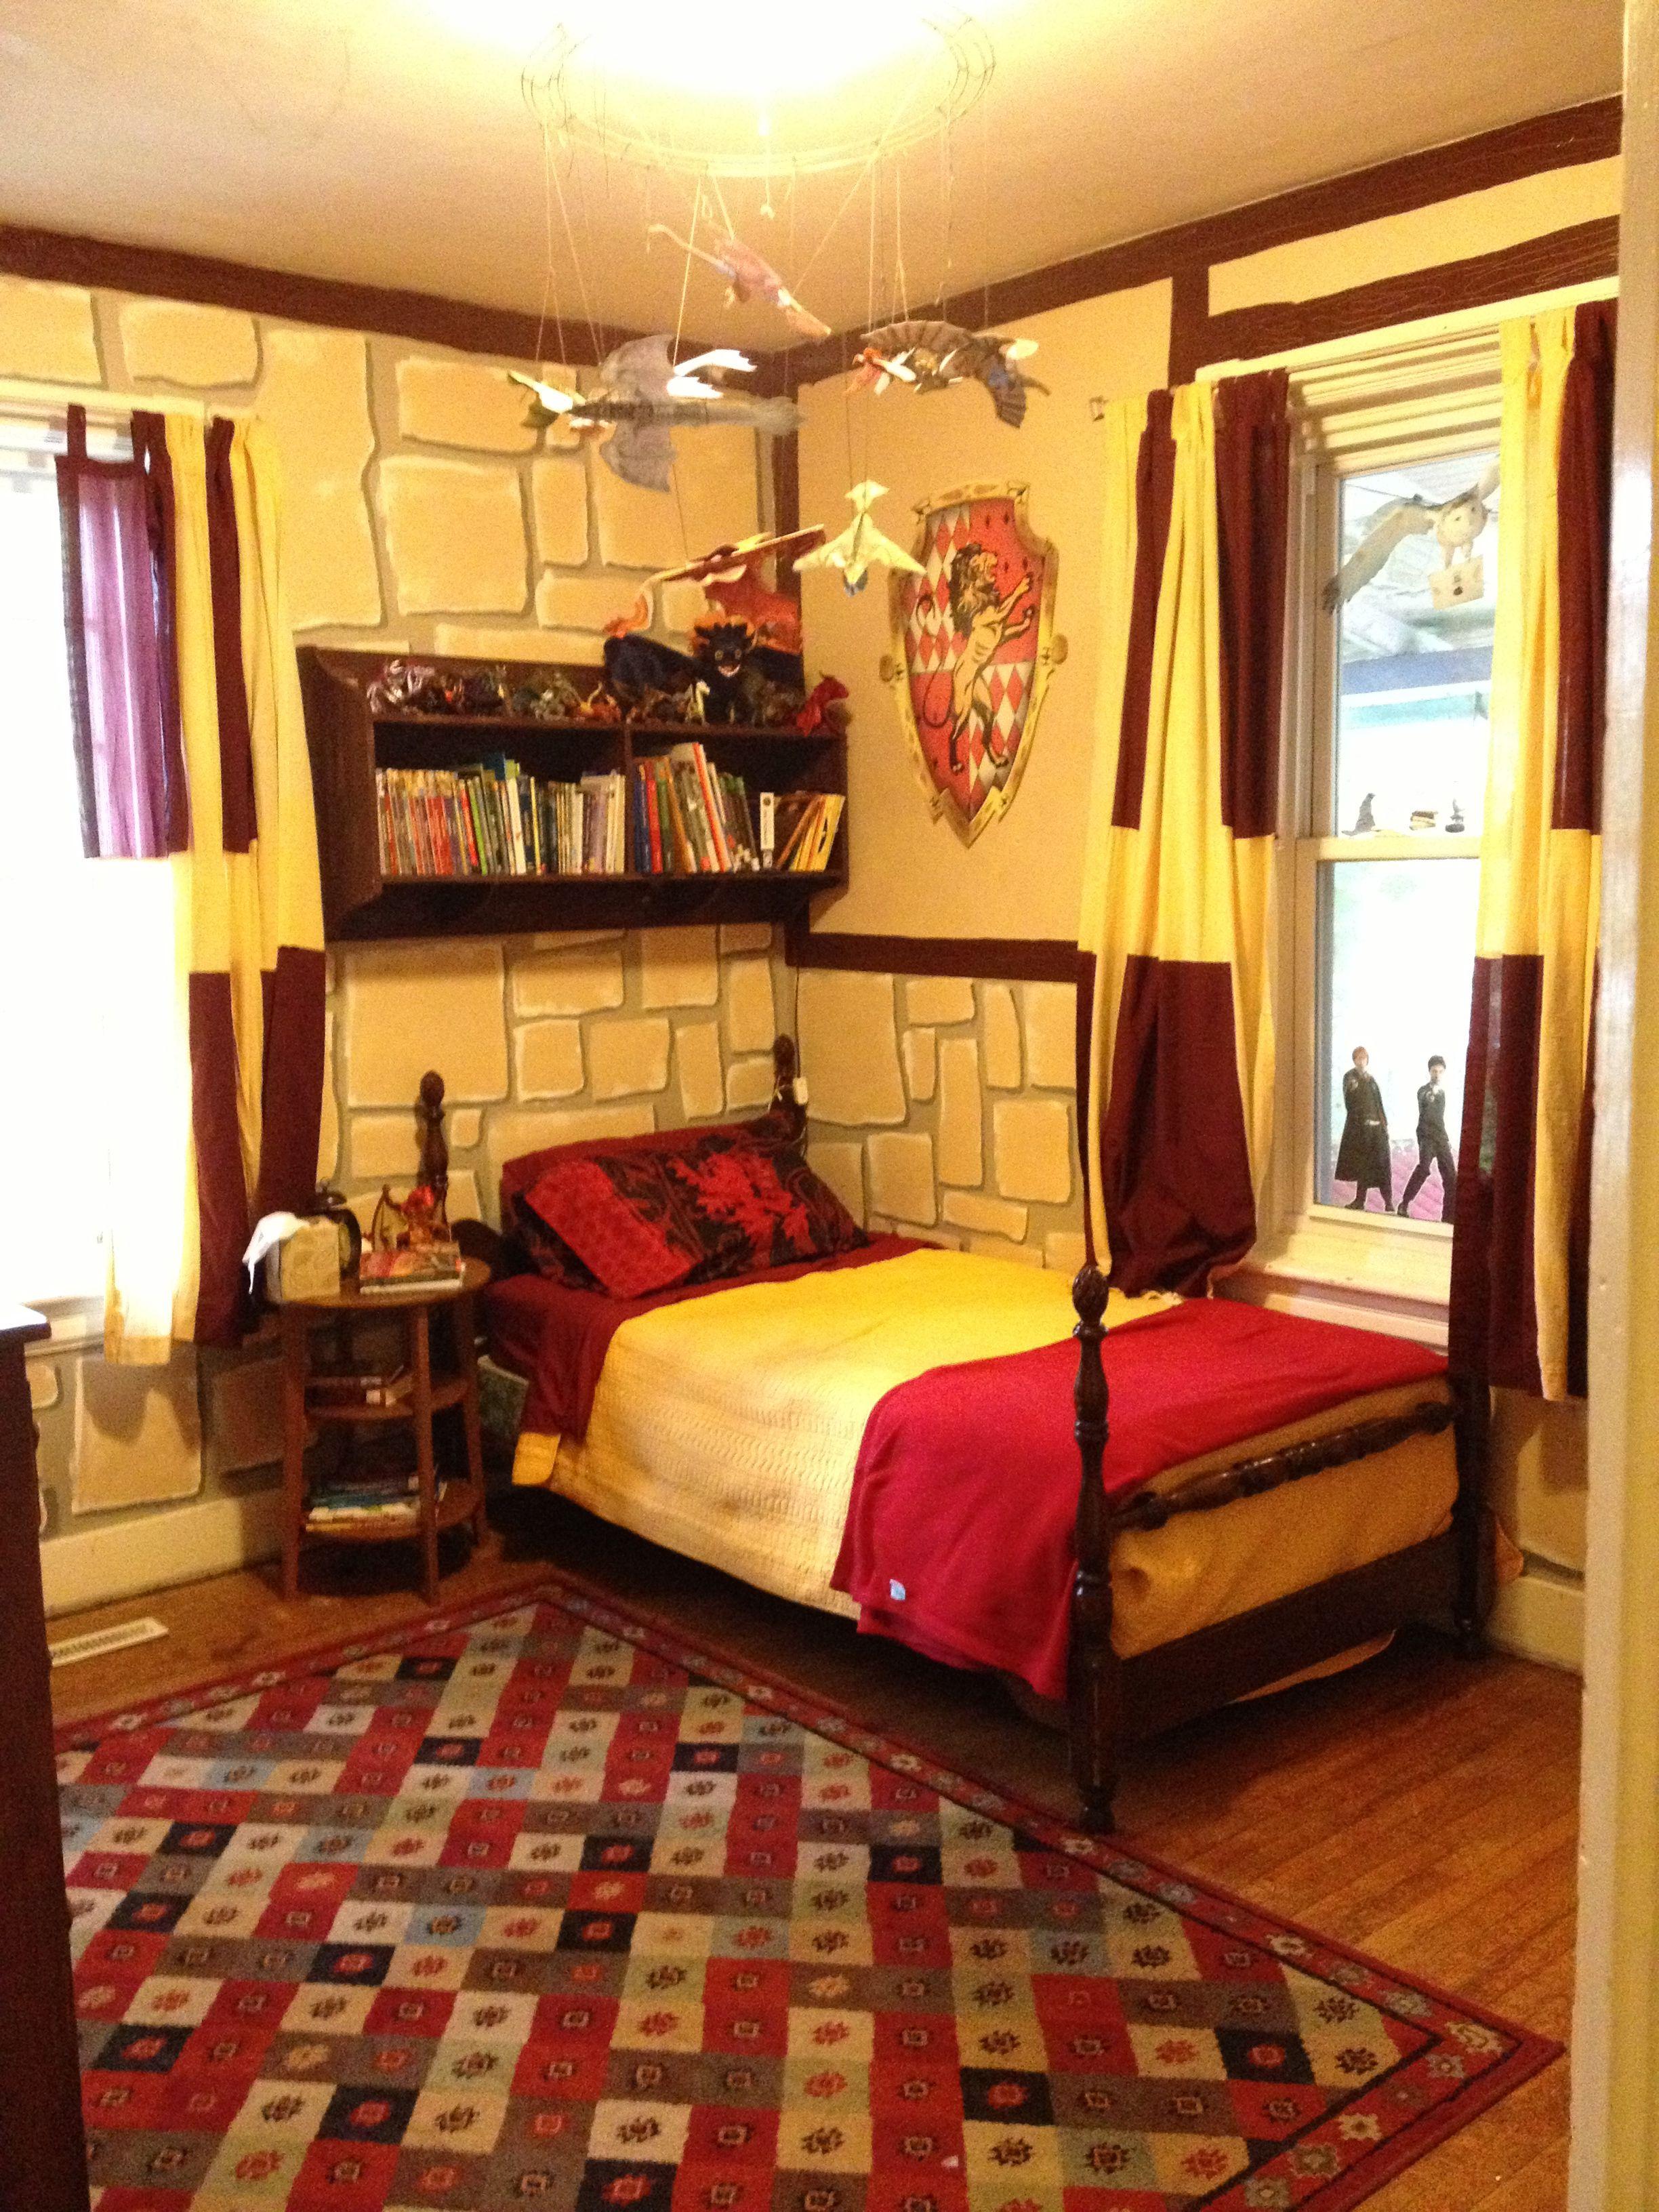 Harry Potter Bedroom Decor Droomkamers Harry Potter Slaapkamer